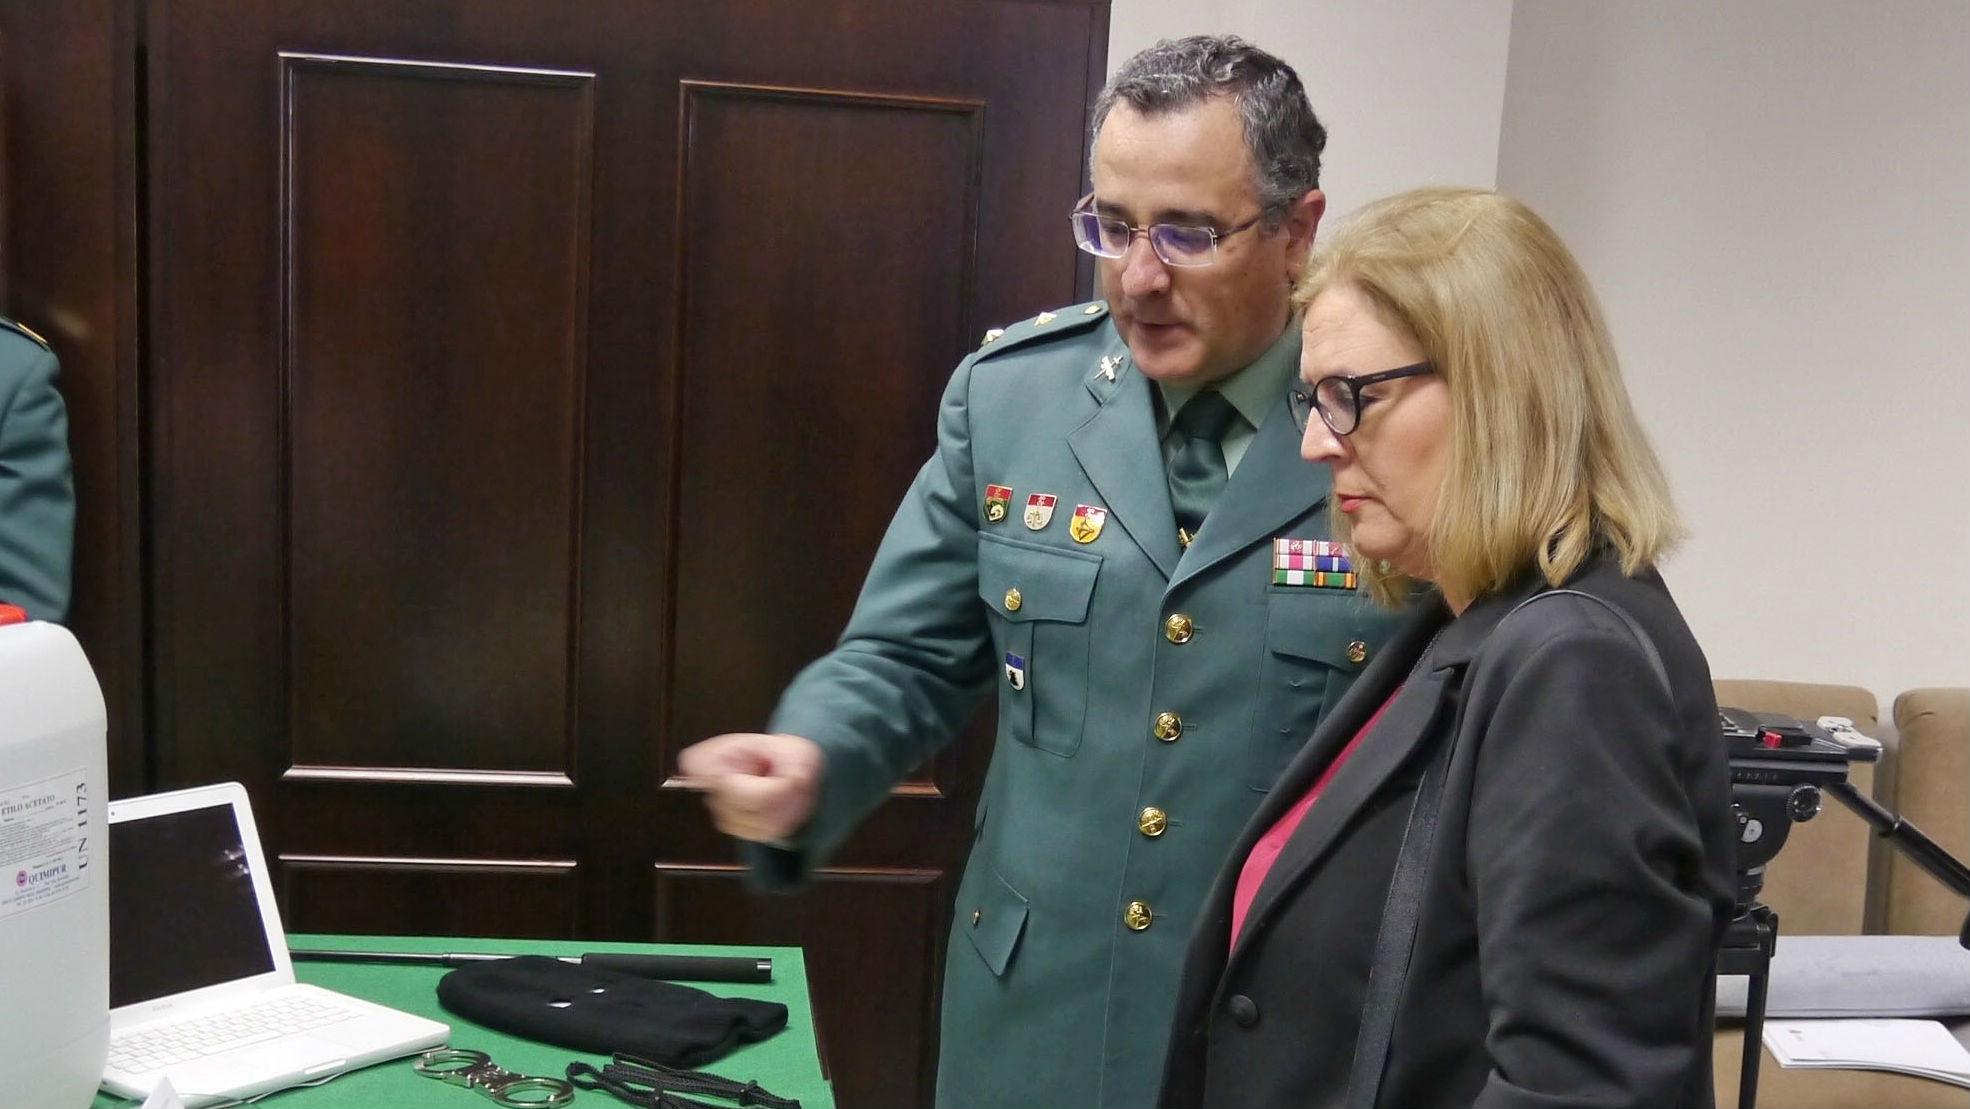 La subdelegada del Gobierno, Francisca Molina, observa cocaína incautada en la operaciones.